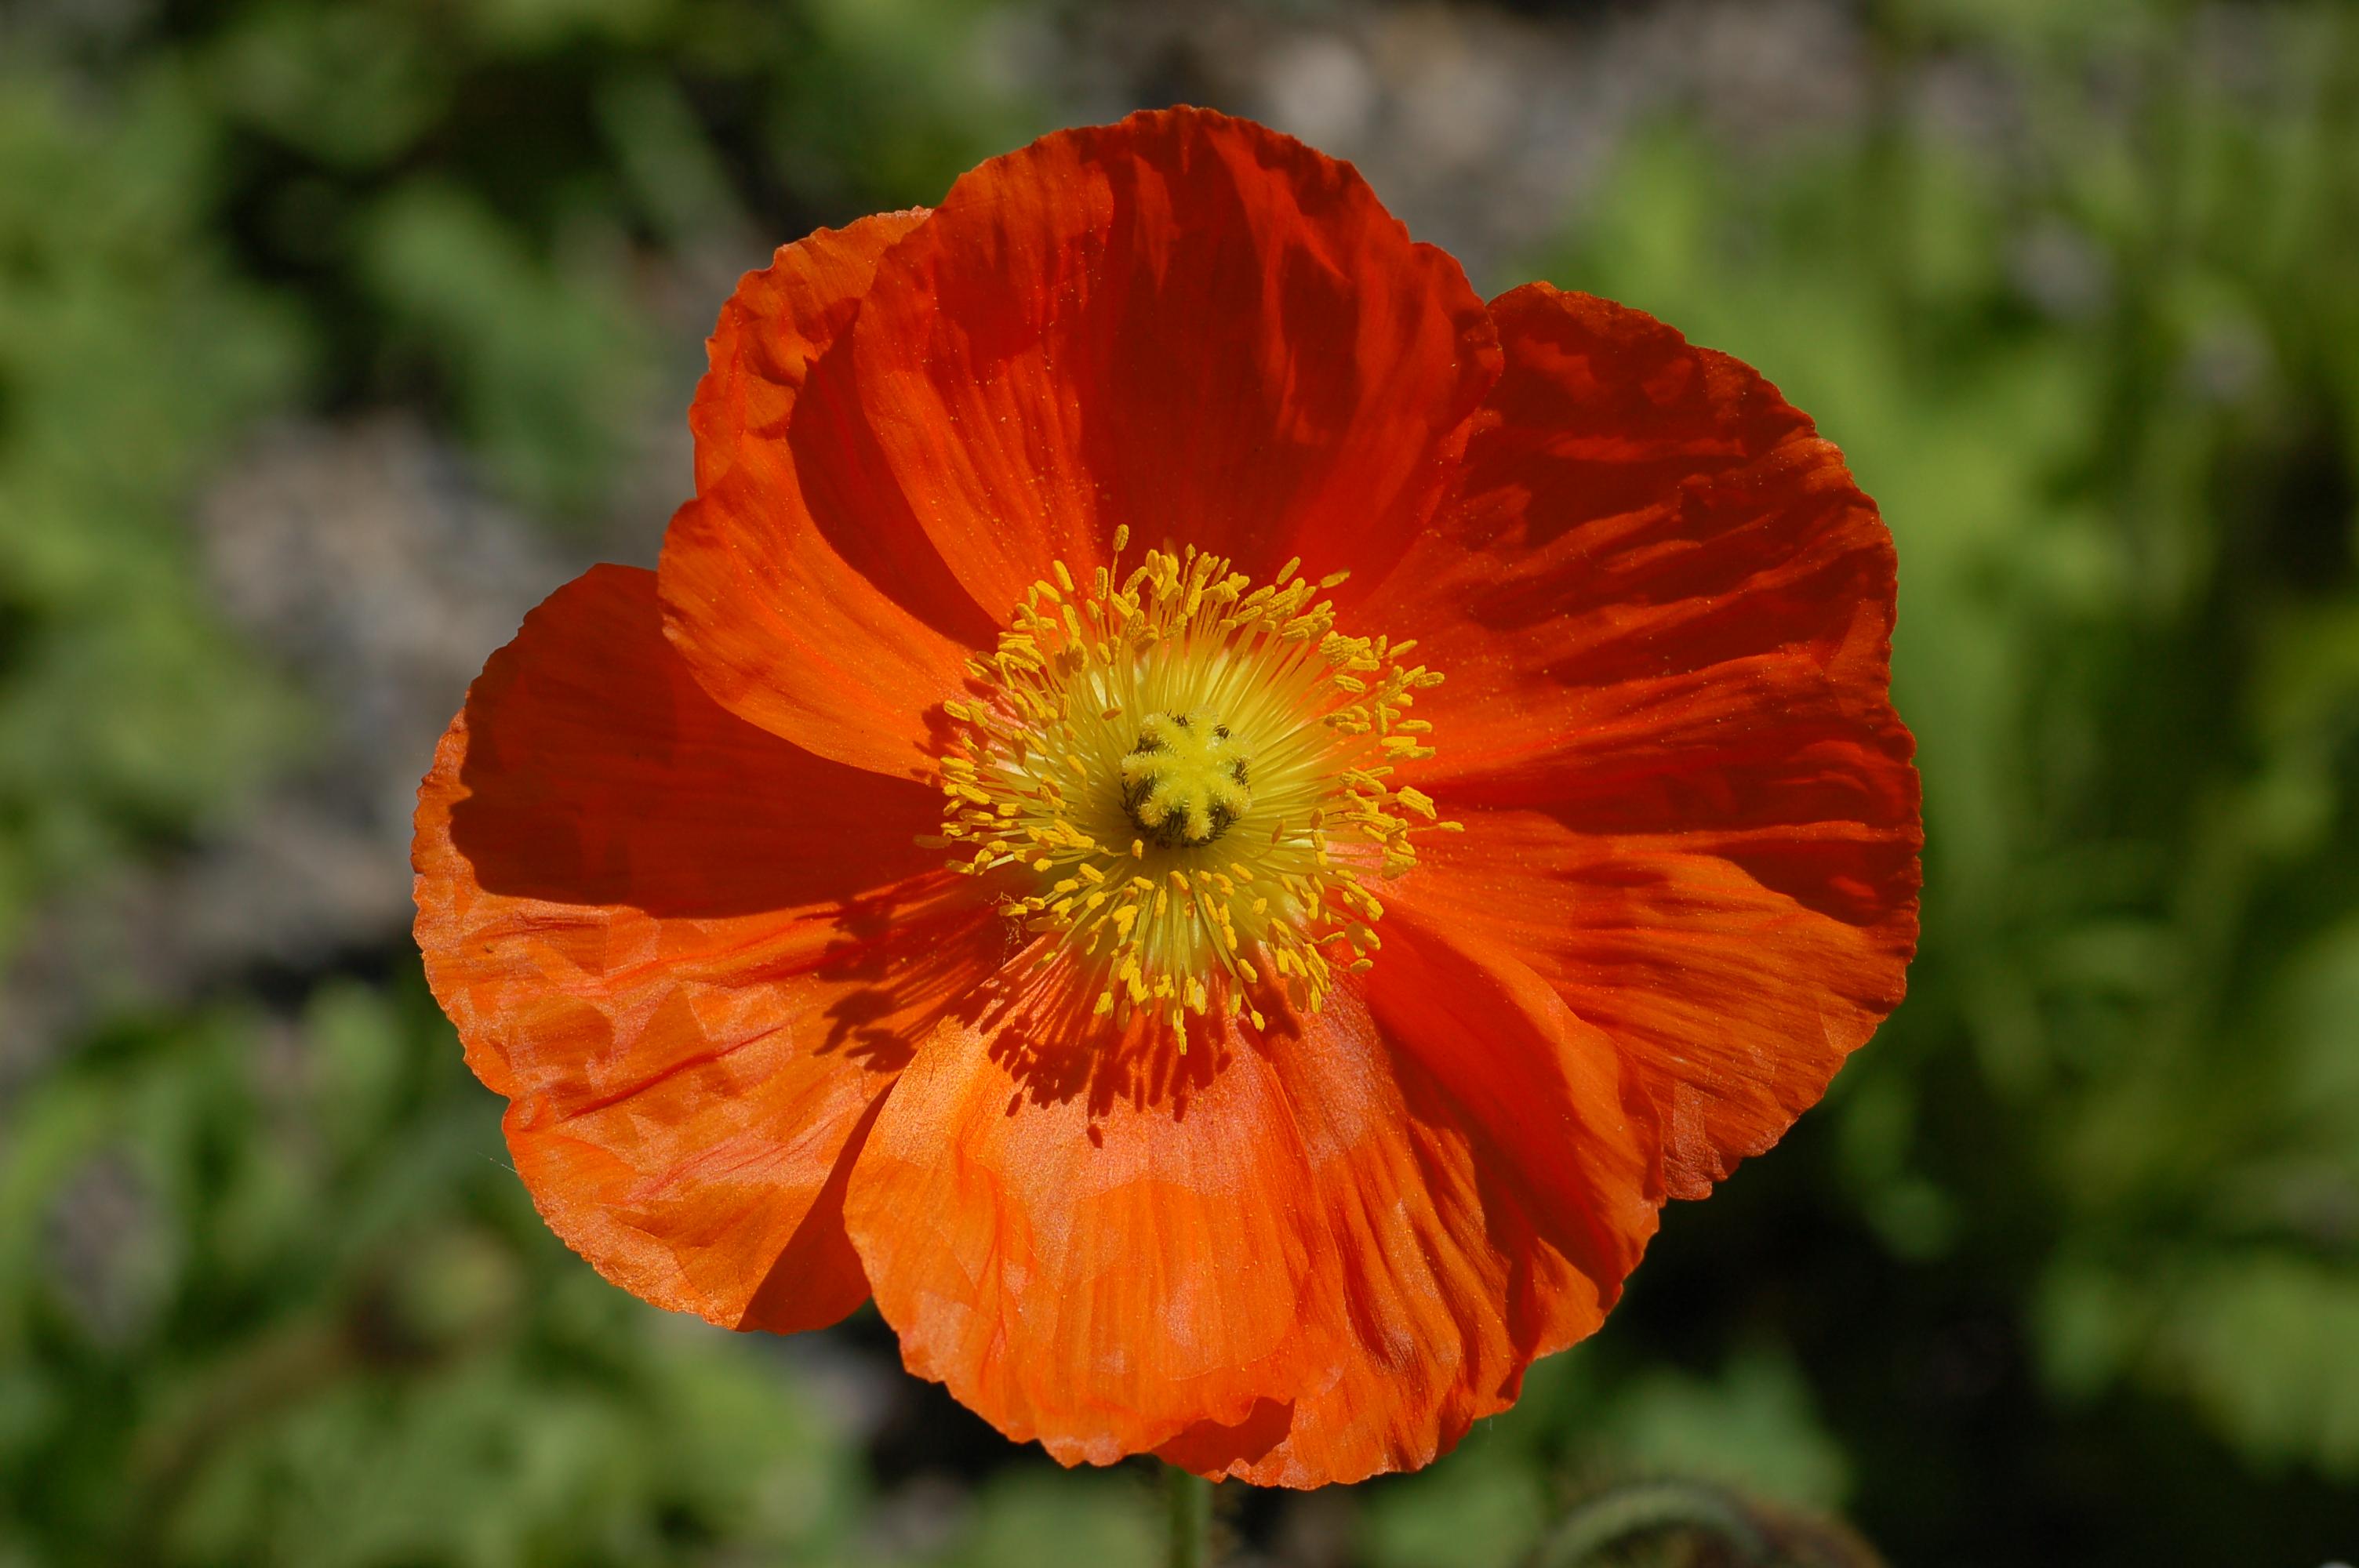 Iceland_Poppy_Papaver_nudicaule_'Champagne_Bubbles'_Orange_Flower